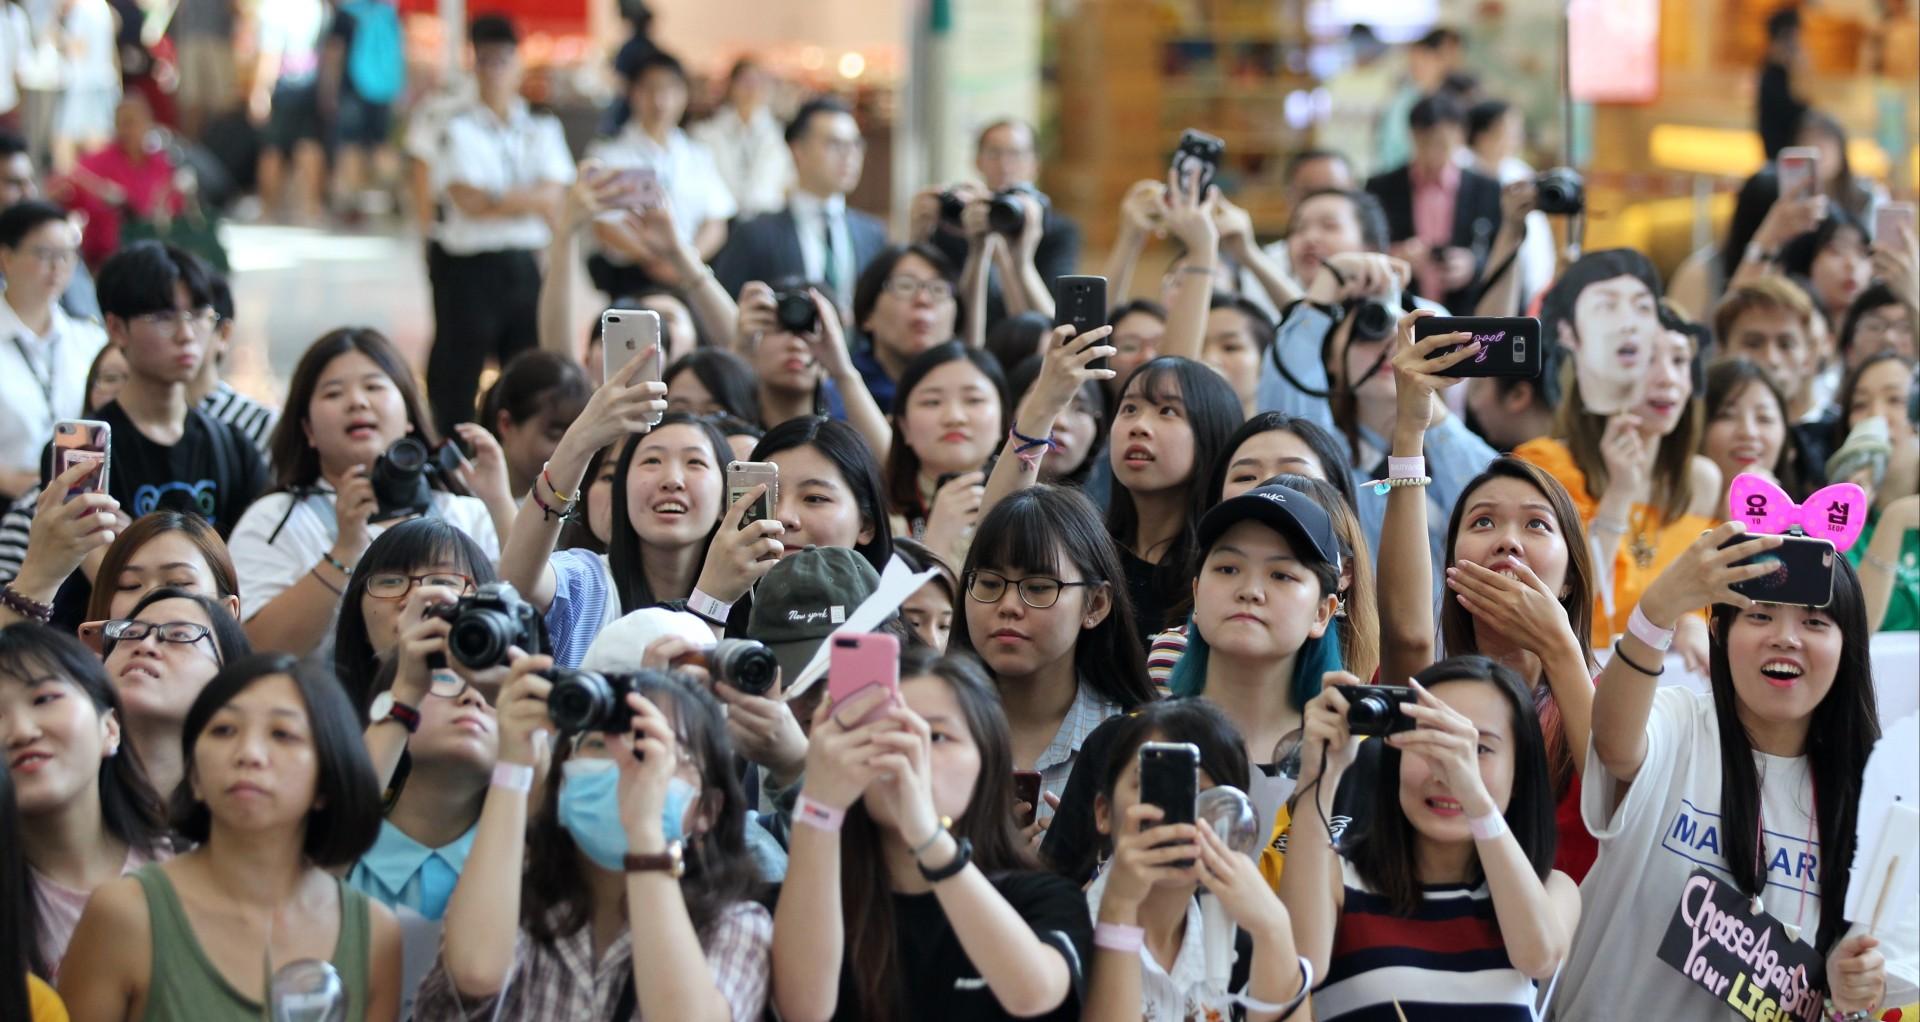 When K-pop superfans turn ugly – the dark side of the Korean pop